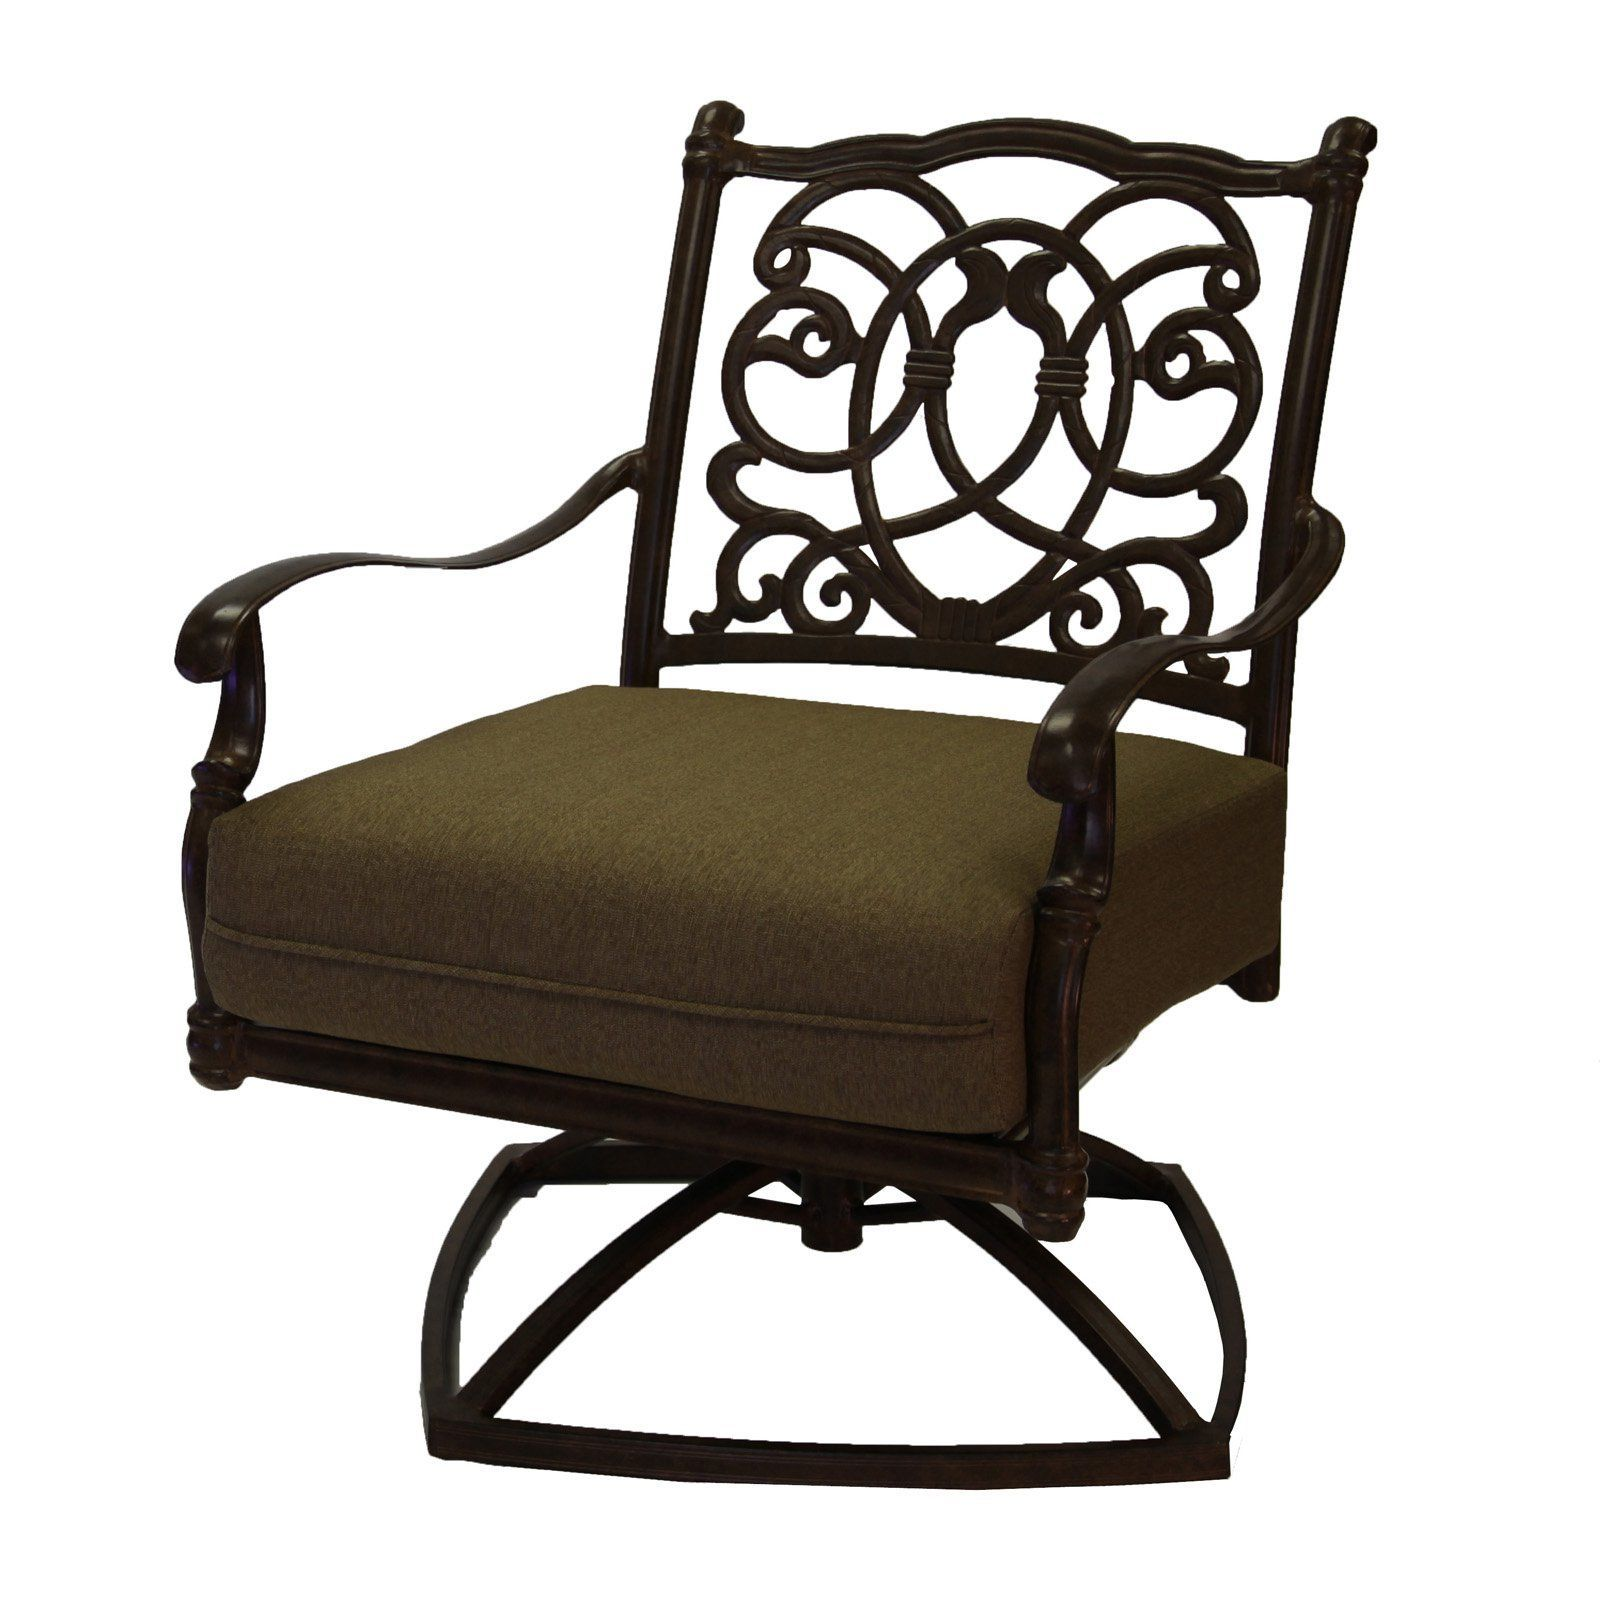 Outdoor Darlee Florence Swivel Rocker Patio Club Chair